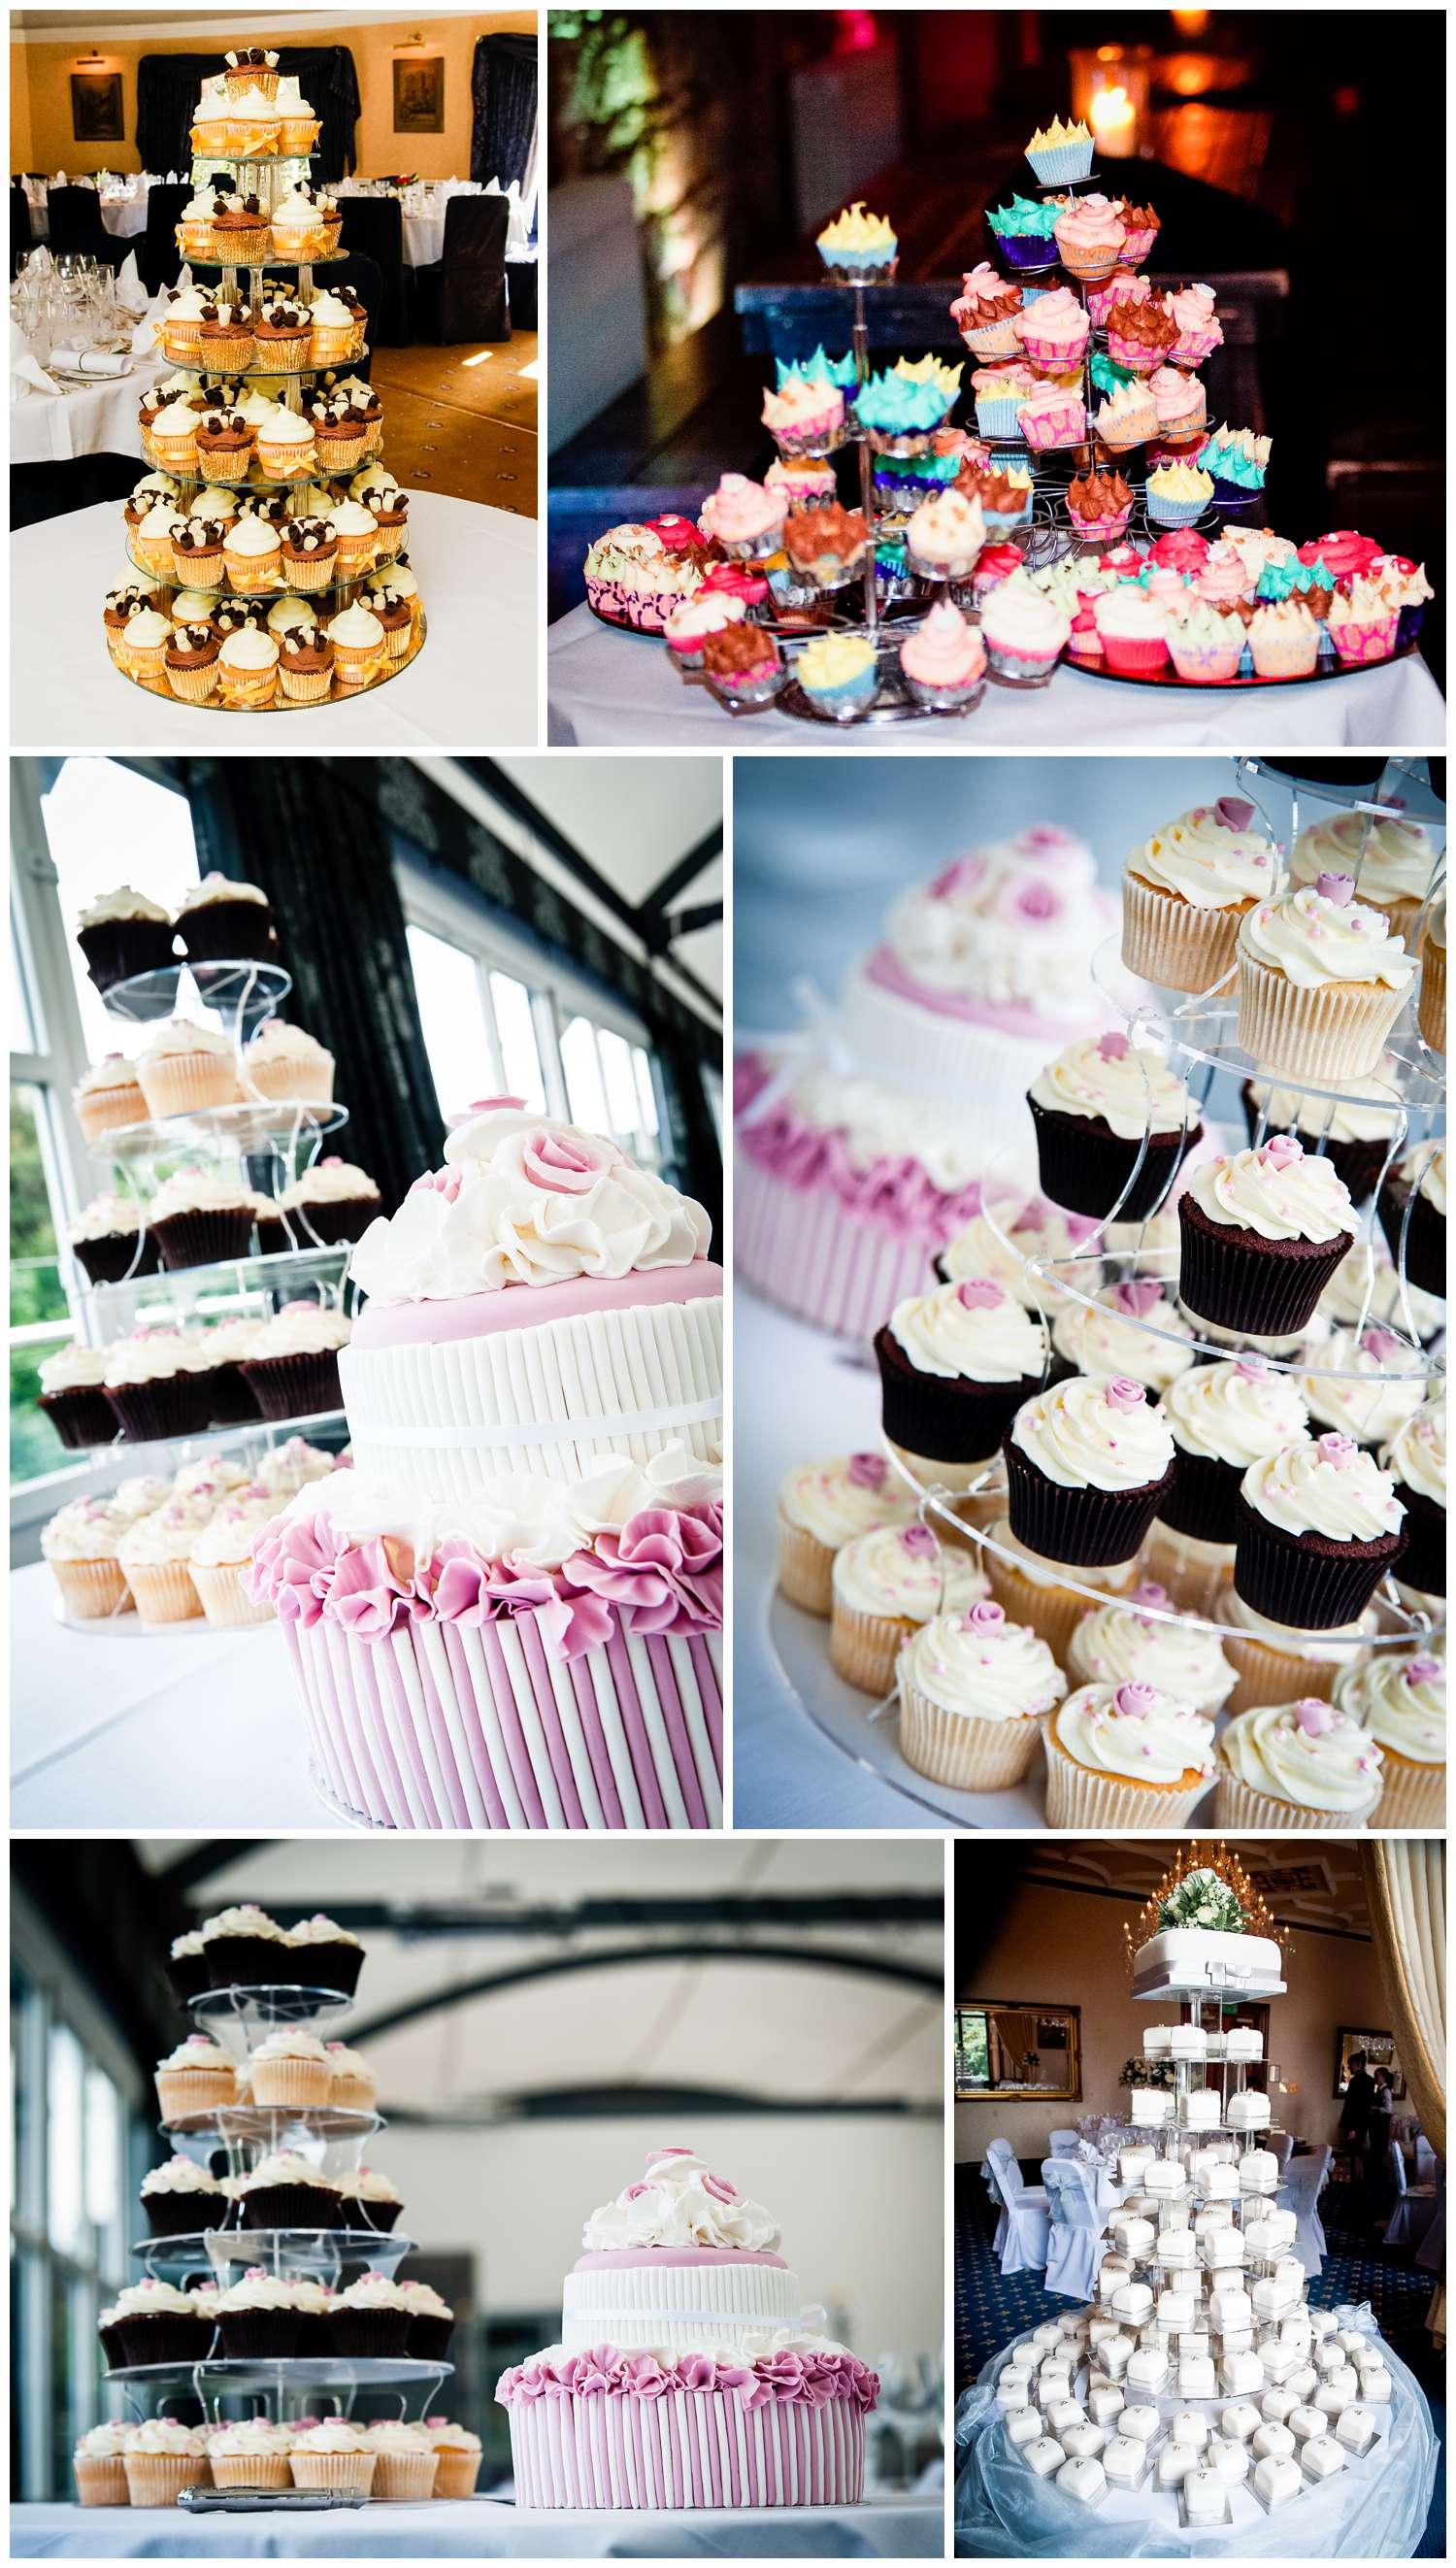 Cupcake wedding cake ideas, ideas for your wedding cake